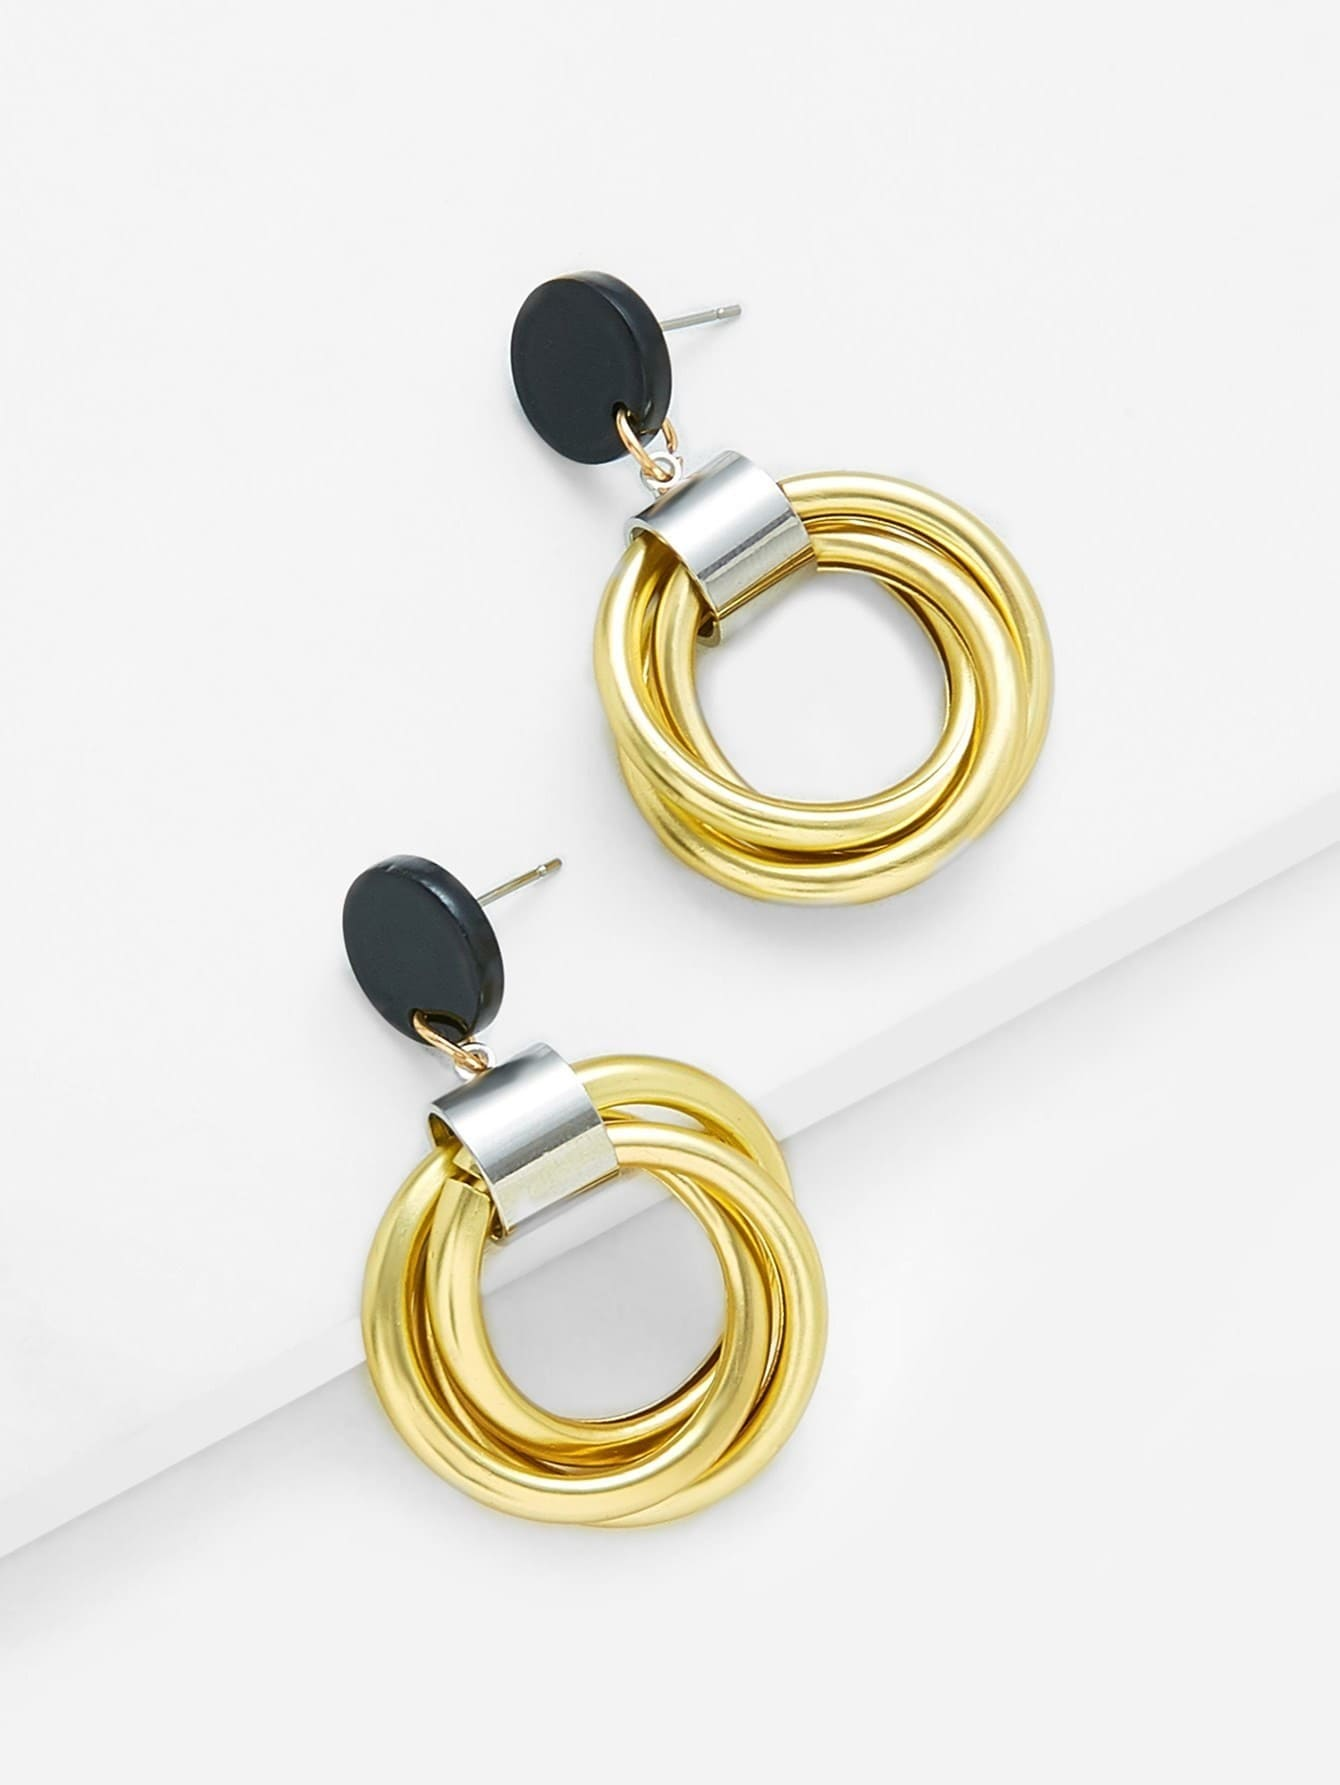 Wrap Ring Design Drop Earrings open irregular ring design earrings